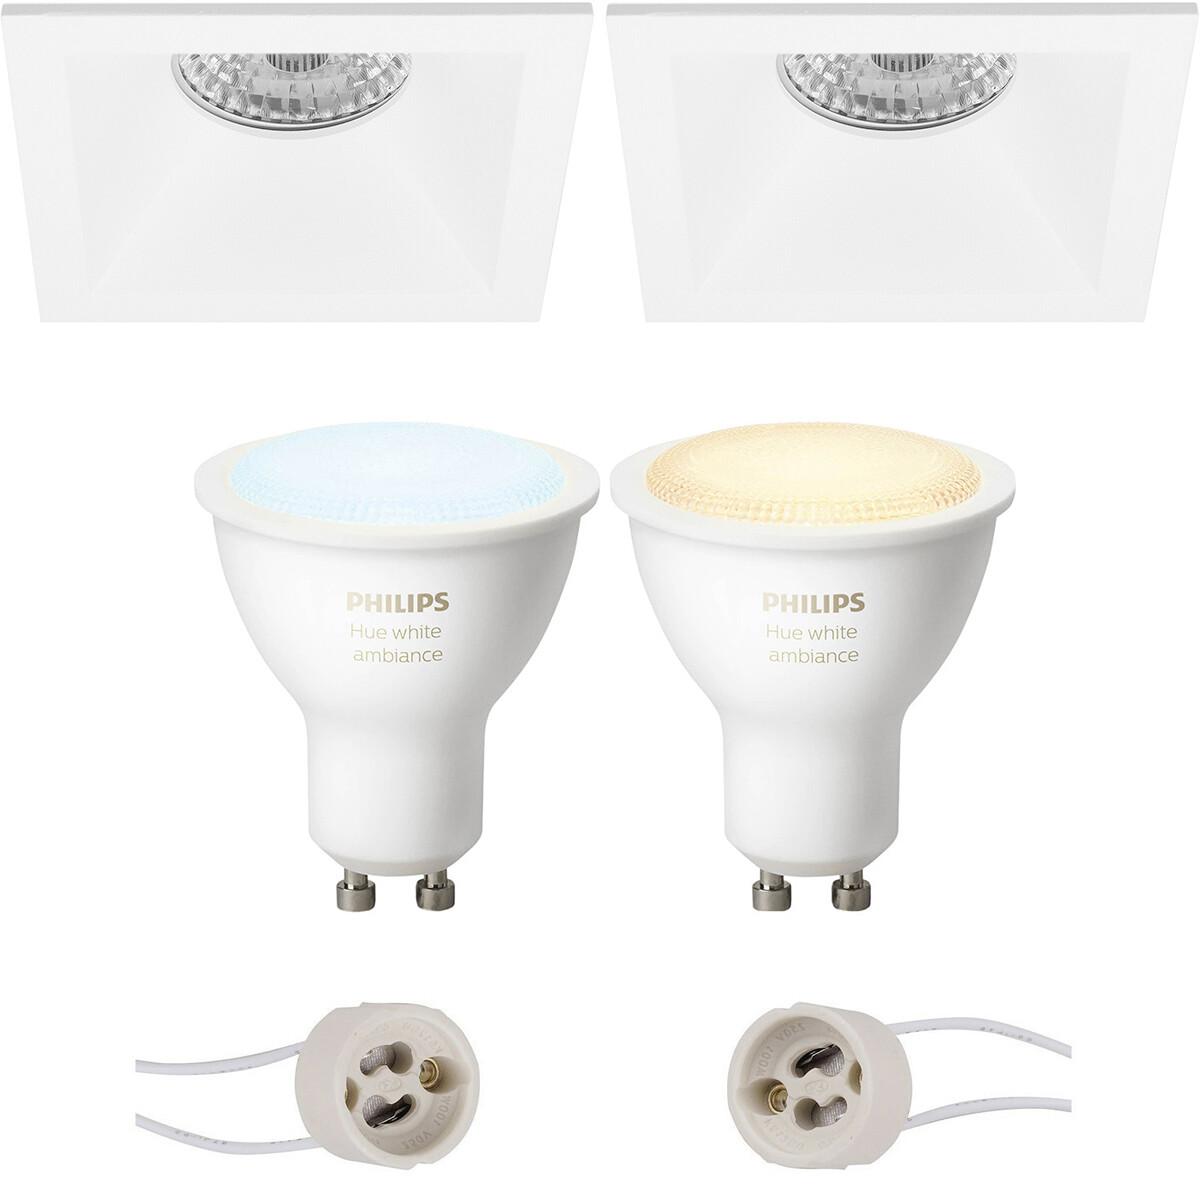 Pragmi Pollon Pro - Inbouw Vierkant - Mat Wit - Verdiept - 82mm - Philips Hue - LED Spot Set GU10 -